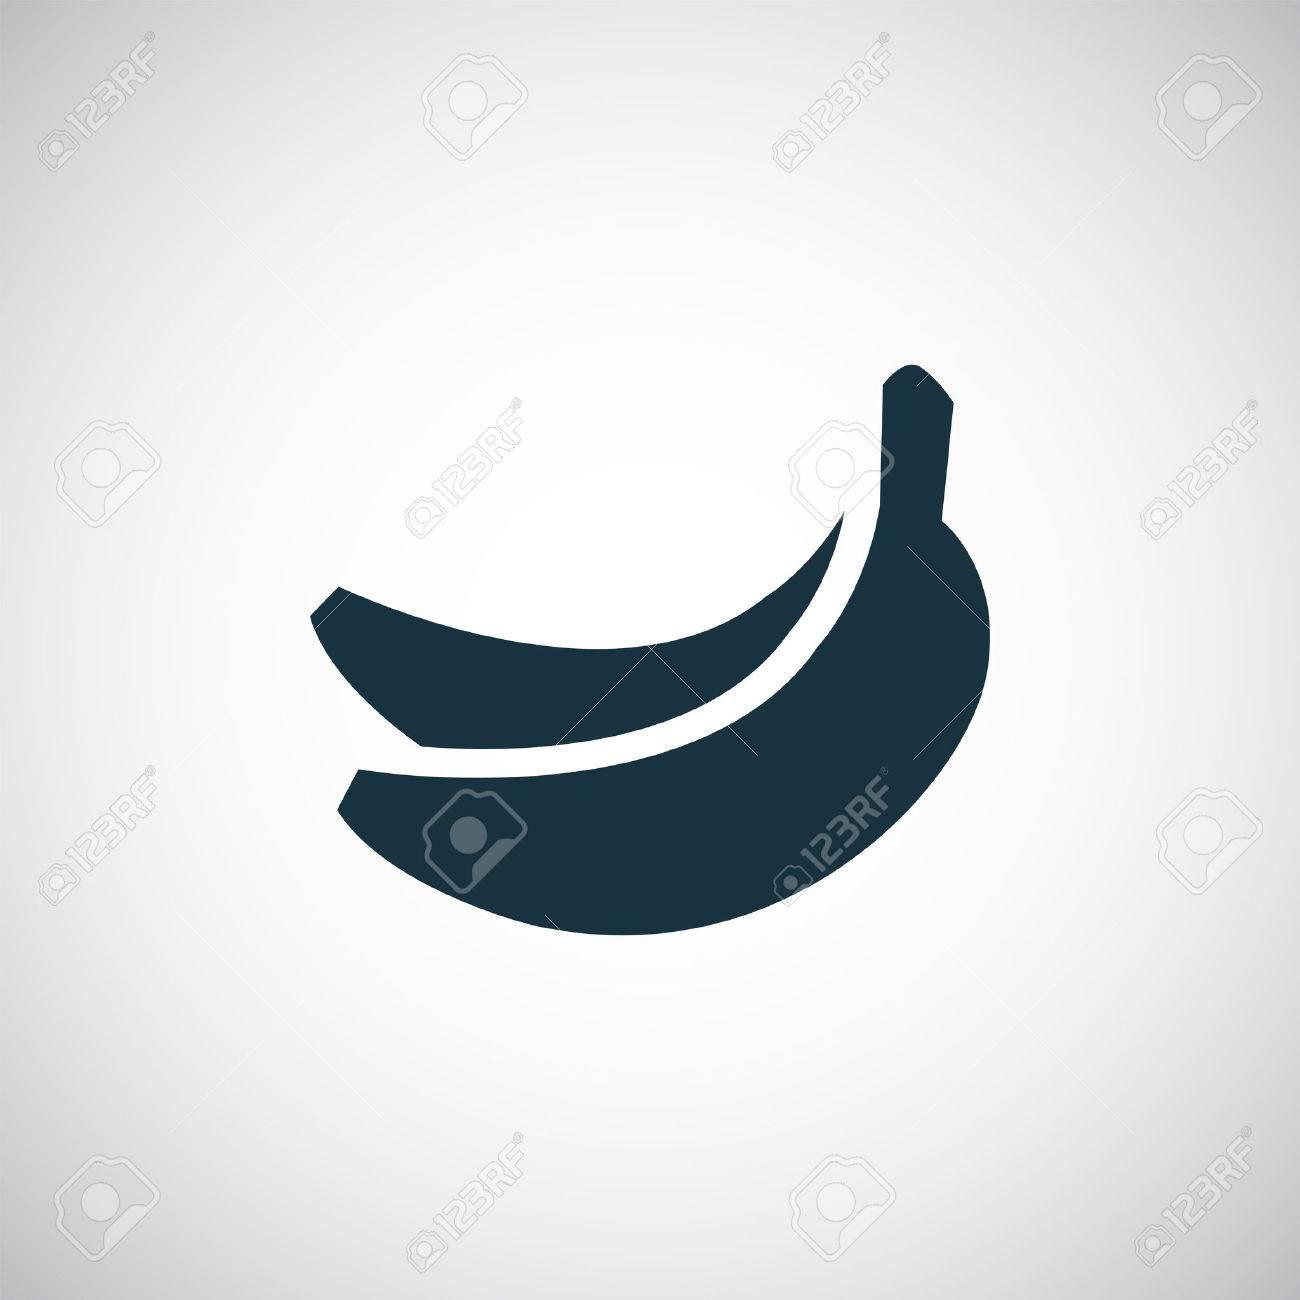 Banana icon isolated black on the white background vector banana icon isolated black on the white background vector stock vector 40104250 biocorpaavc